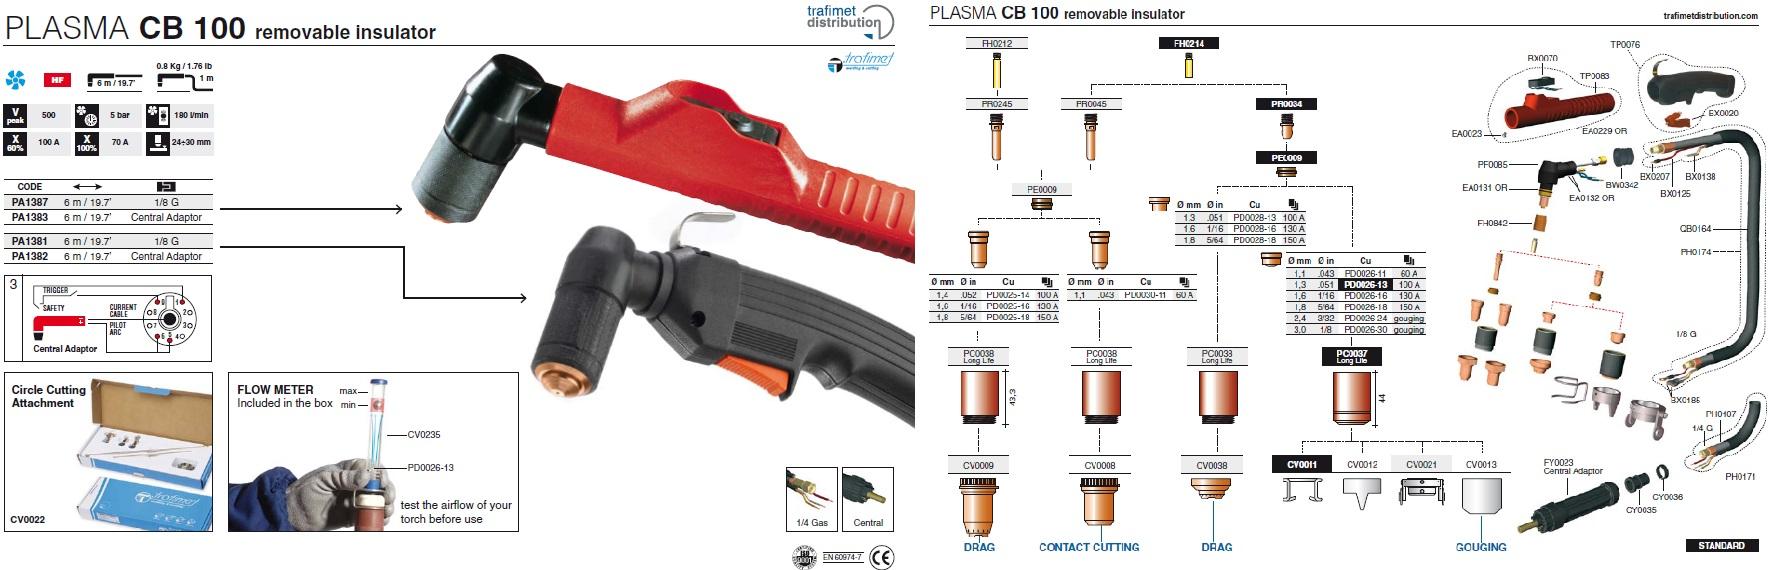 PLASMA CB 100 removable insulator